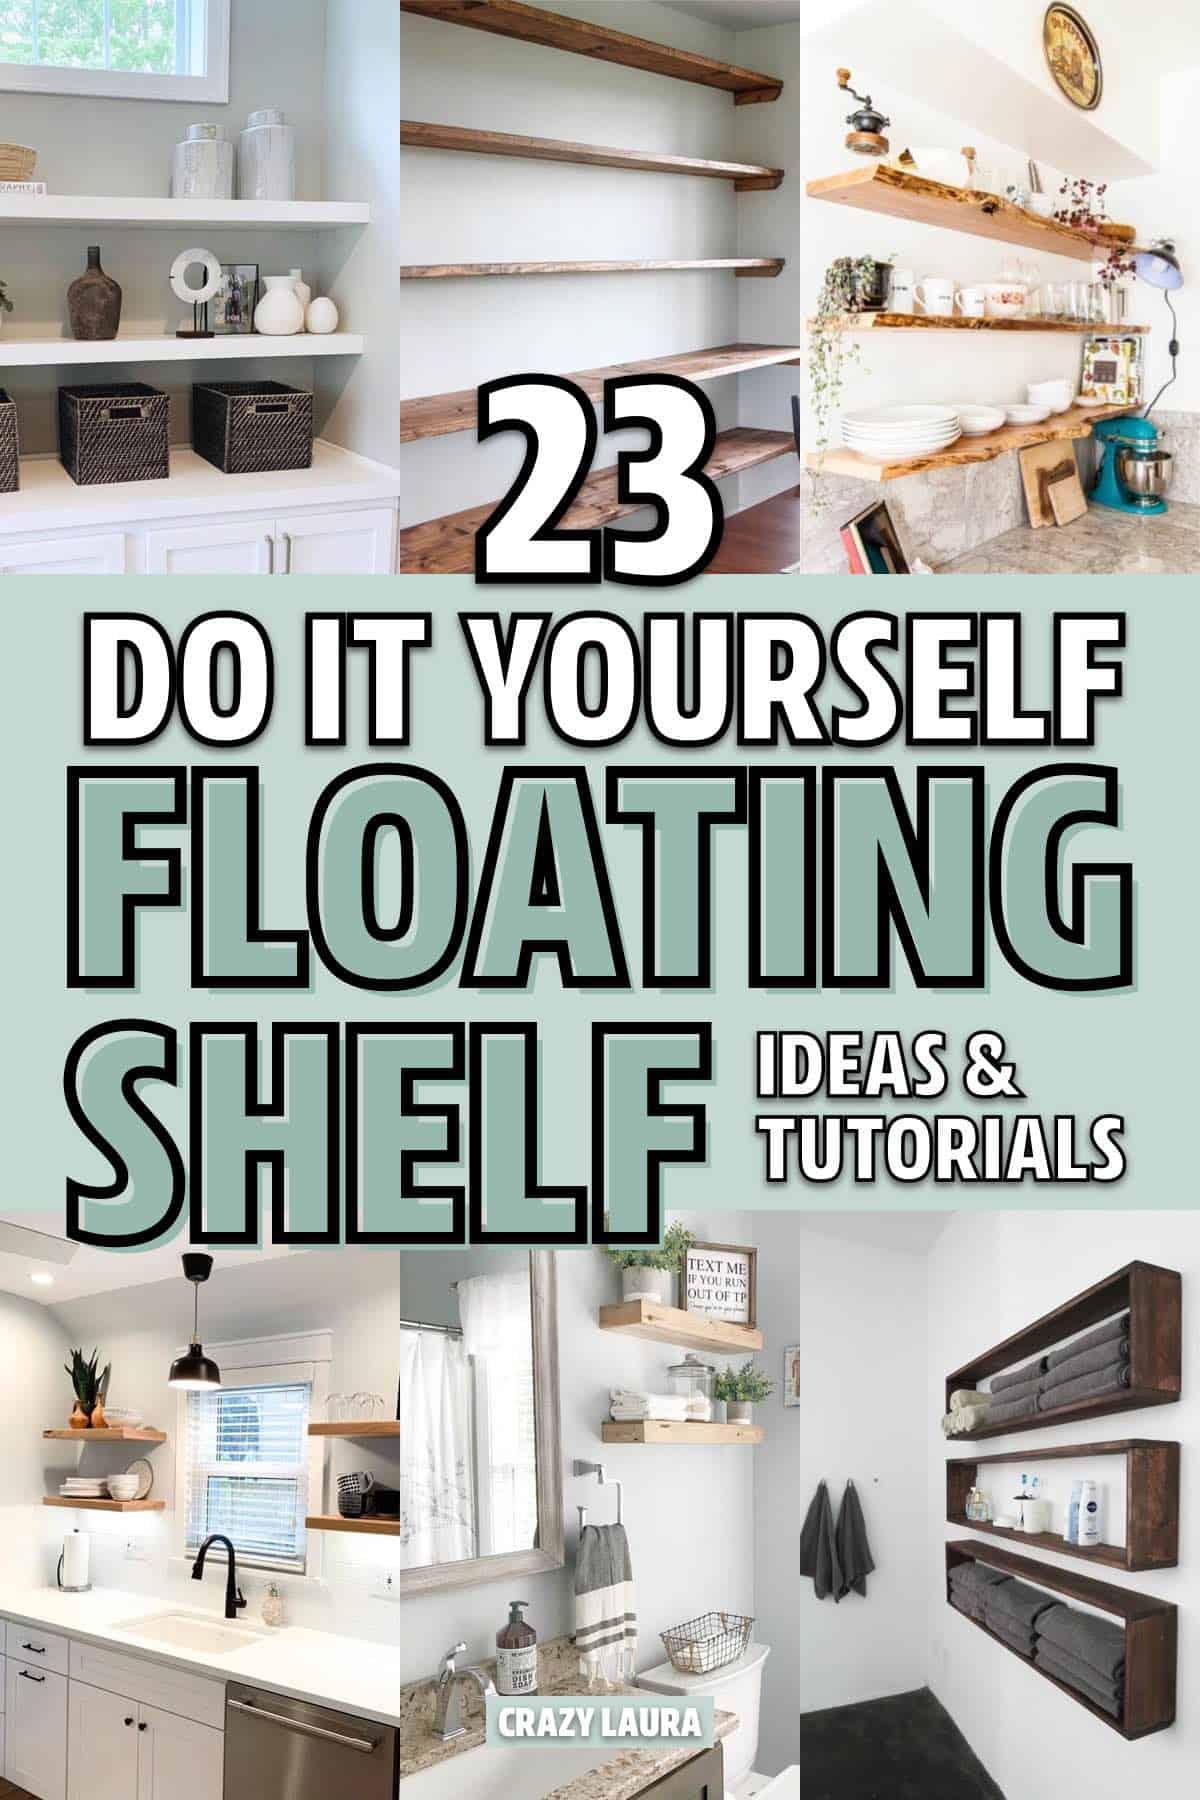 inexpensive diy floating shelf examples